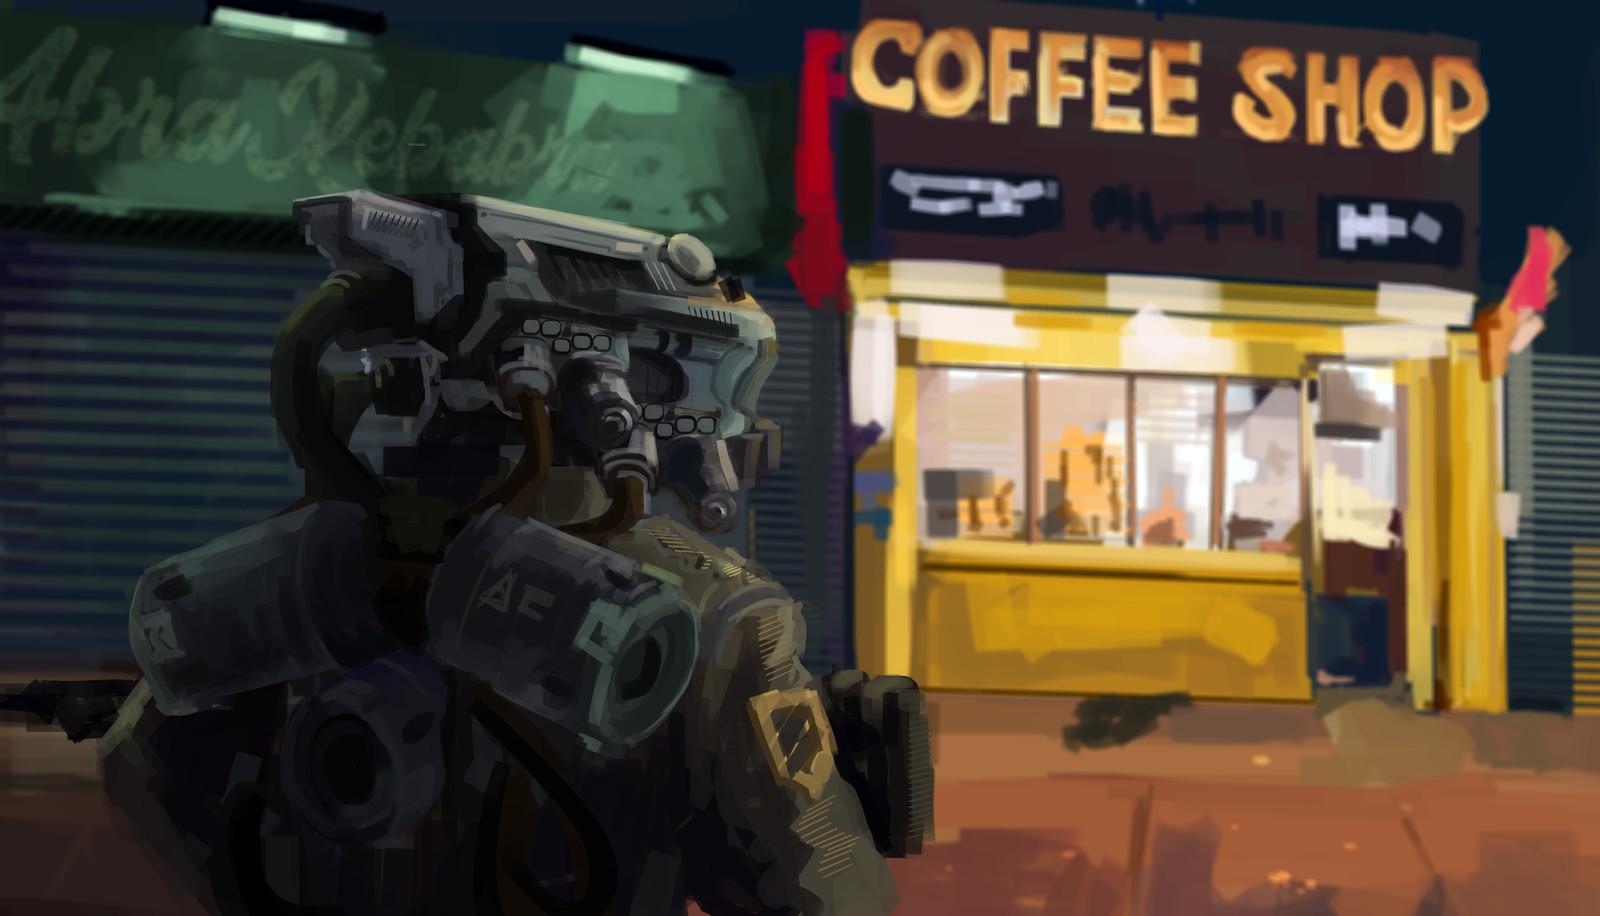 coffeebot?